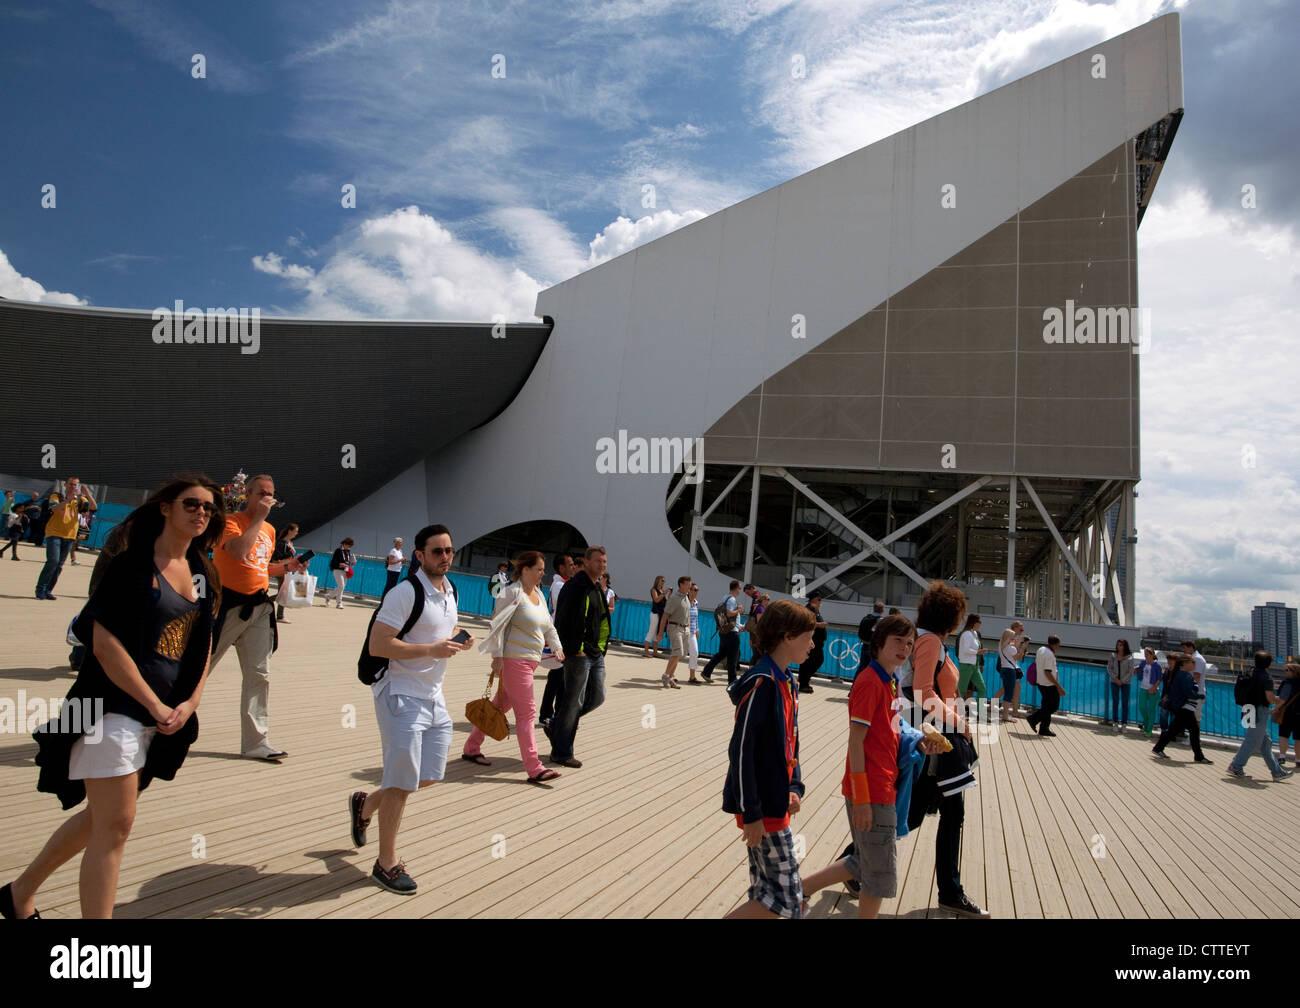 London 2012 Olympic Games - visitors arriving near Aquatics Centre - Stock Image